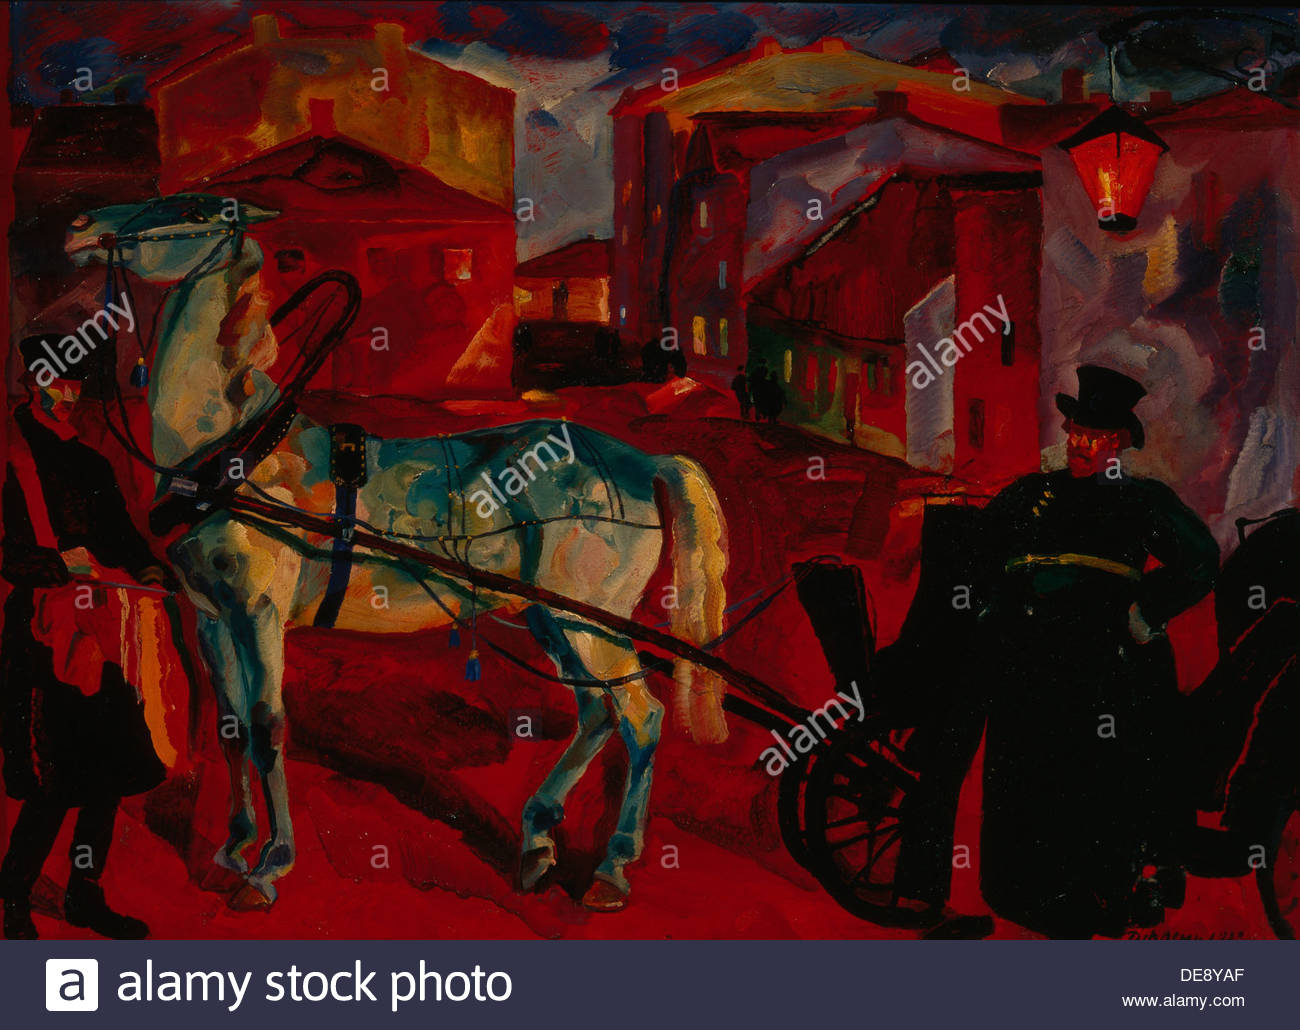 A coachman, 1922. Artist: Frenz, Rudolph Rudolphovich (1888-1956) - Stock Image